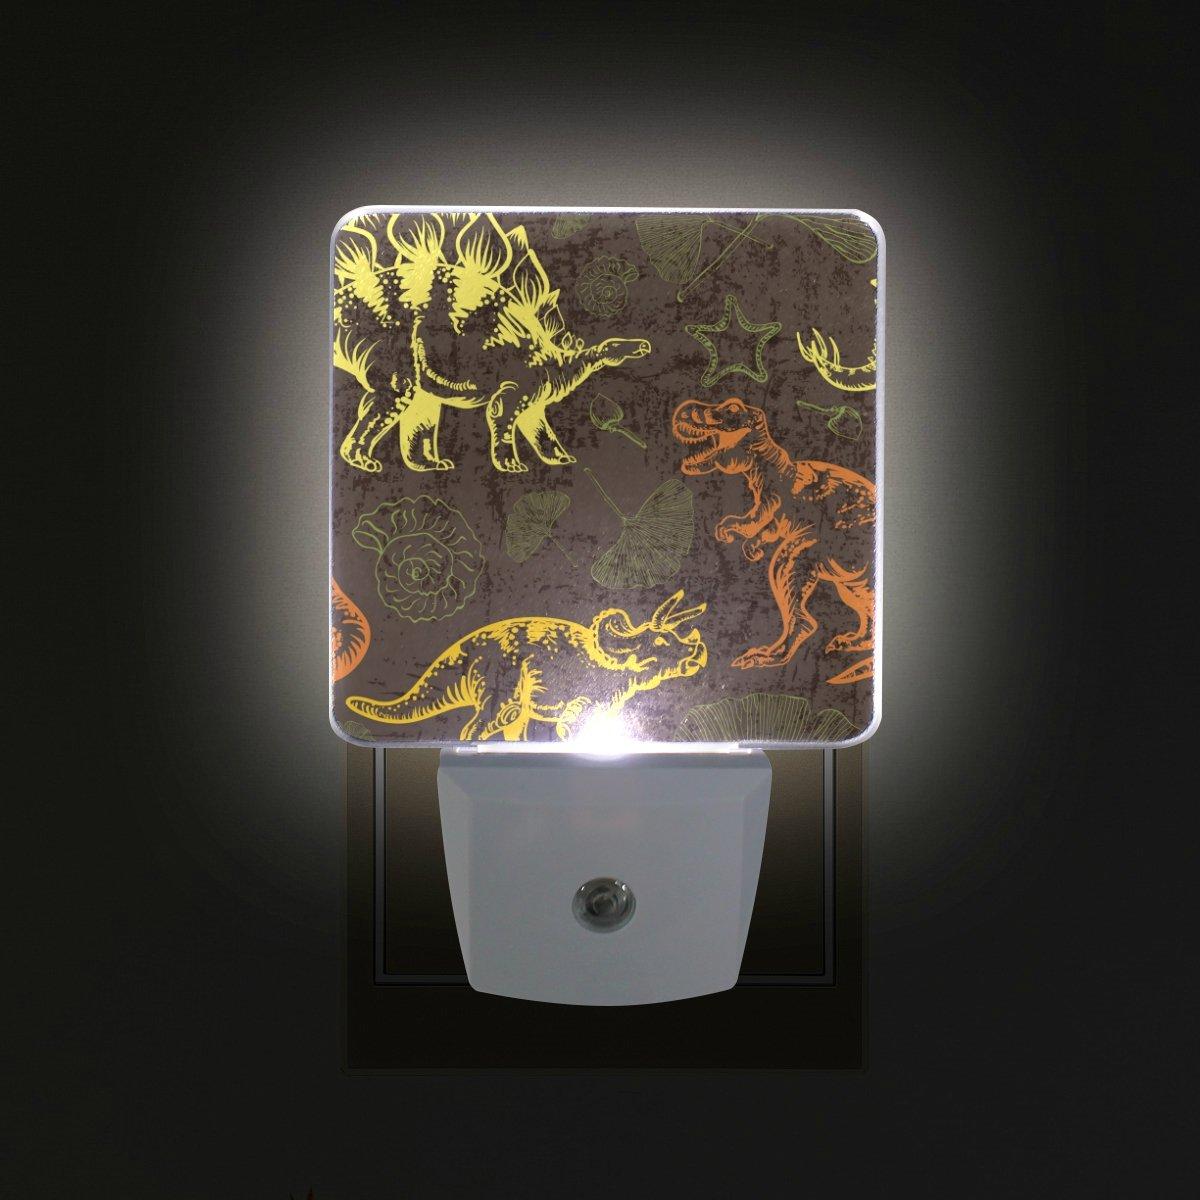 GIOVANIOR Jurassic Dinosaur Plug in Dusk to Dawn Light Sensor LED Night Light Wall Light for Bedroom, Bathroom, Hallway, Stairs, Energy Efficient